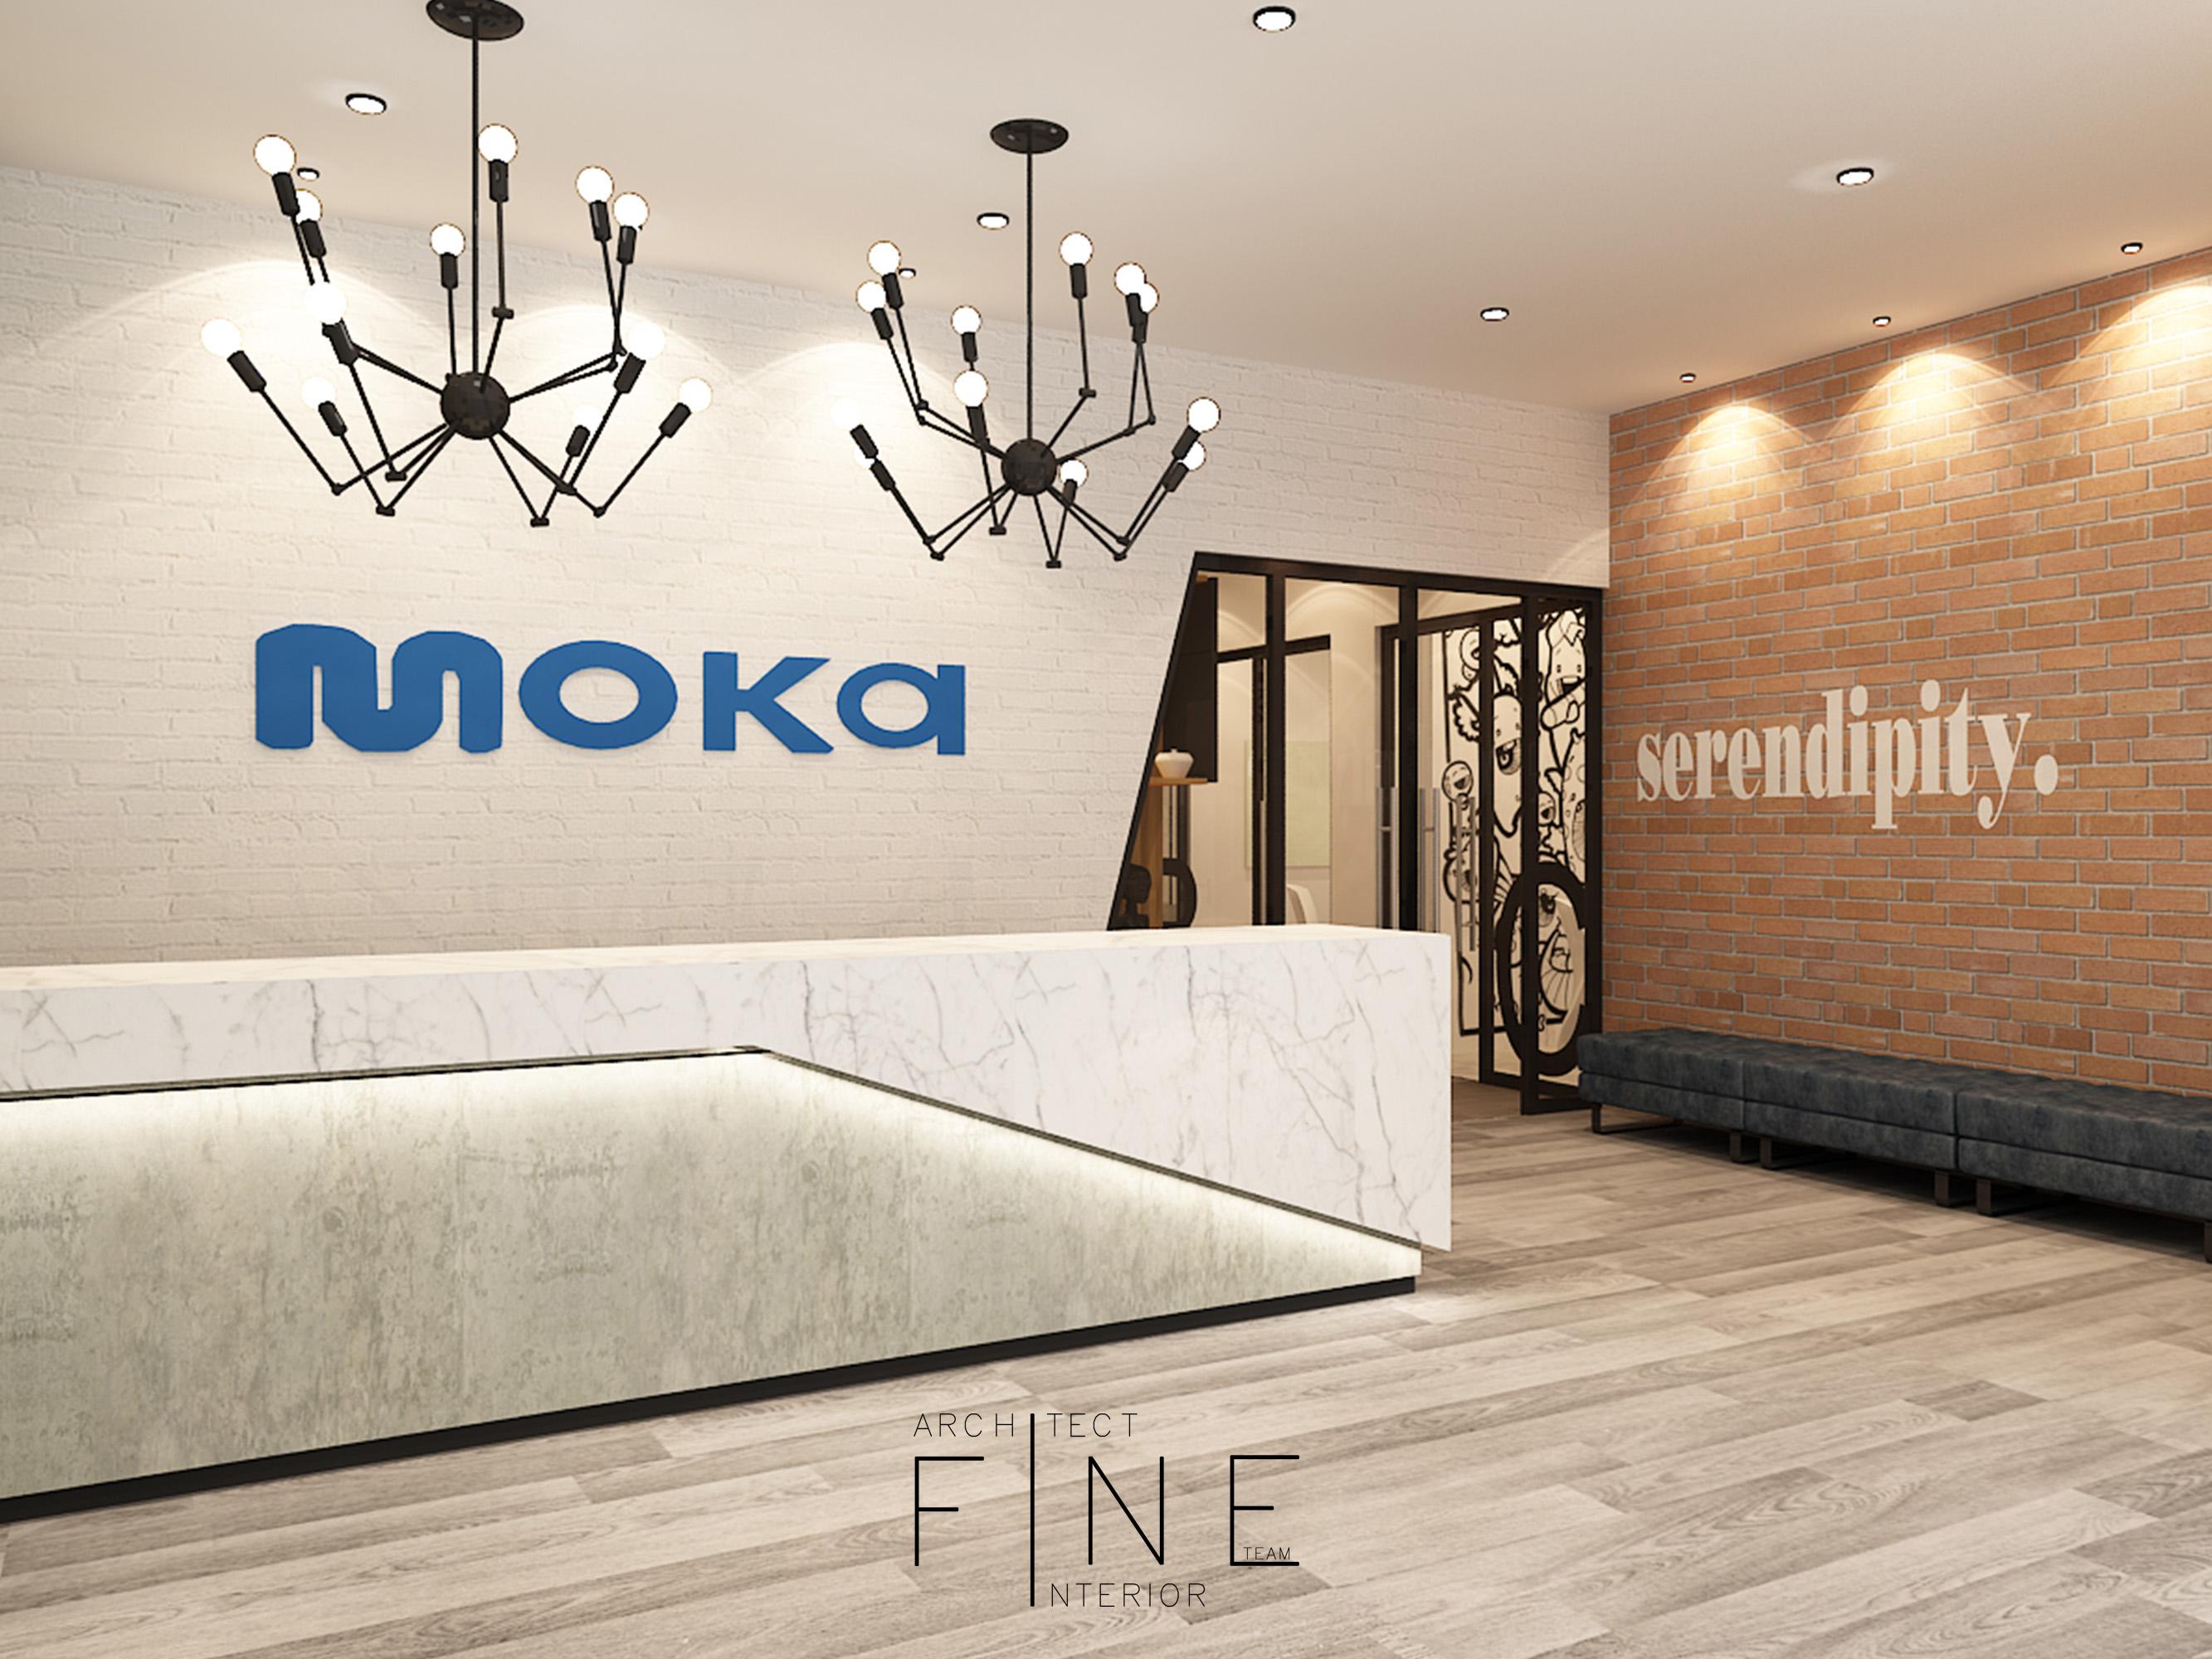 MOKAPOS OFFICE